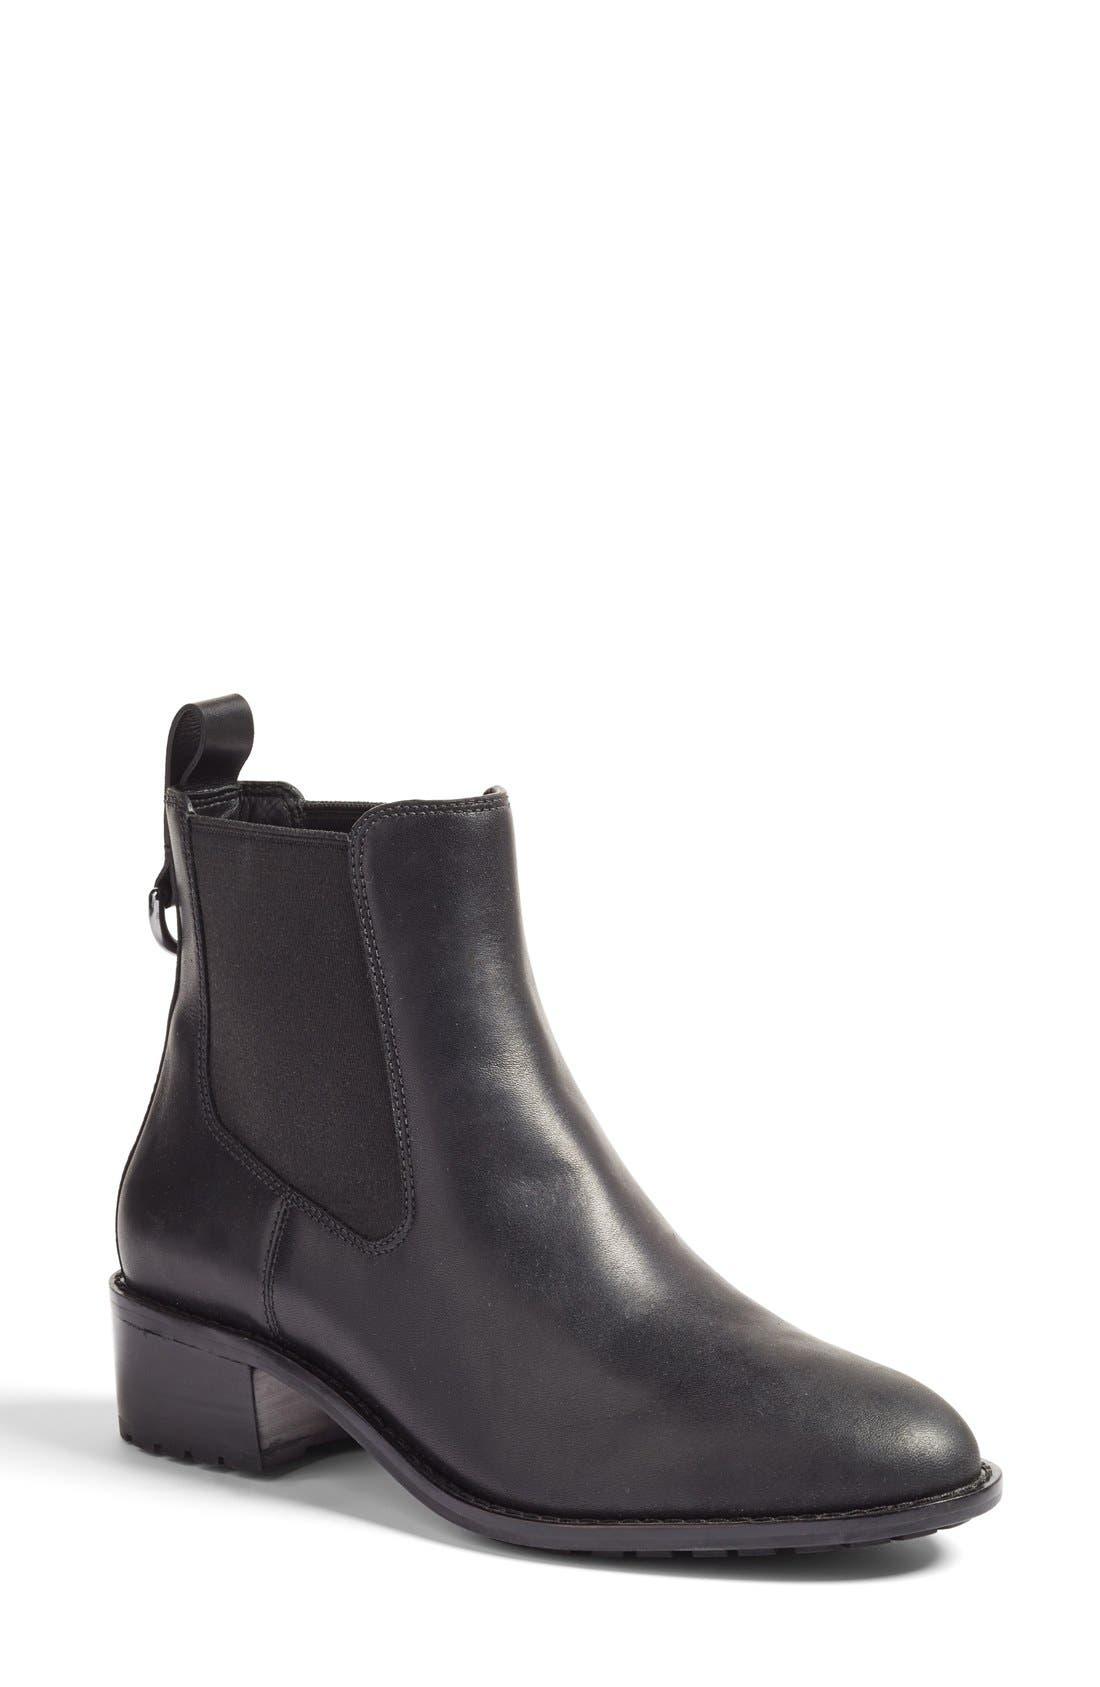 'Newburg' Waterproof Chelsea Boot,                         Main,                         color, BLACK LEATHER